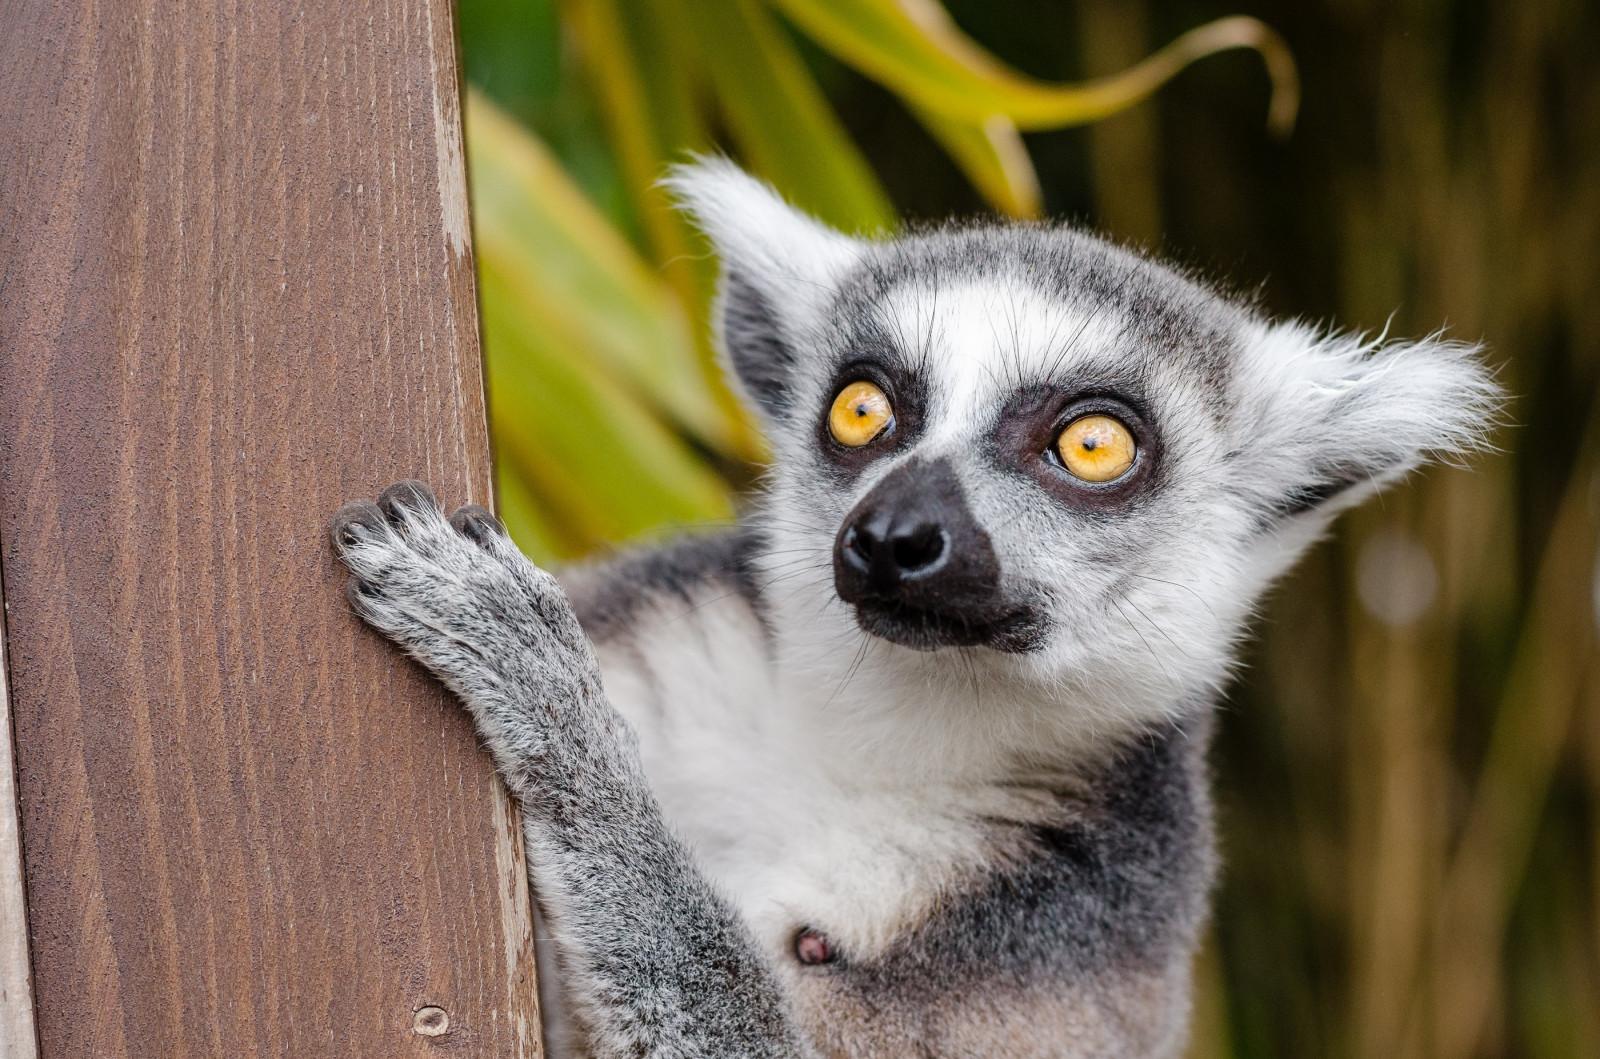 Cool Lemur Wallpaper - lemur_look_spotted-566596  Snapshot_574747.jpg!d